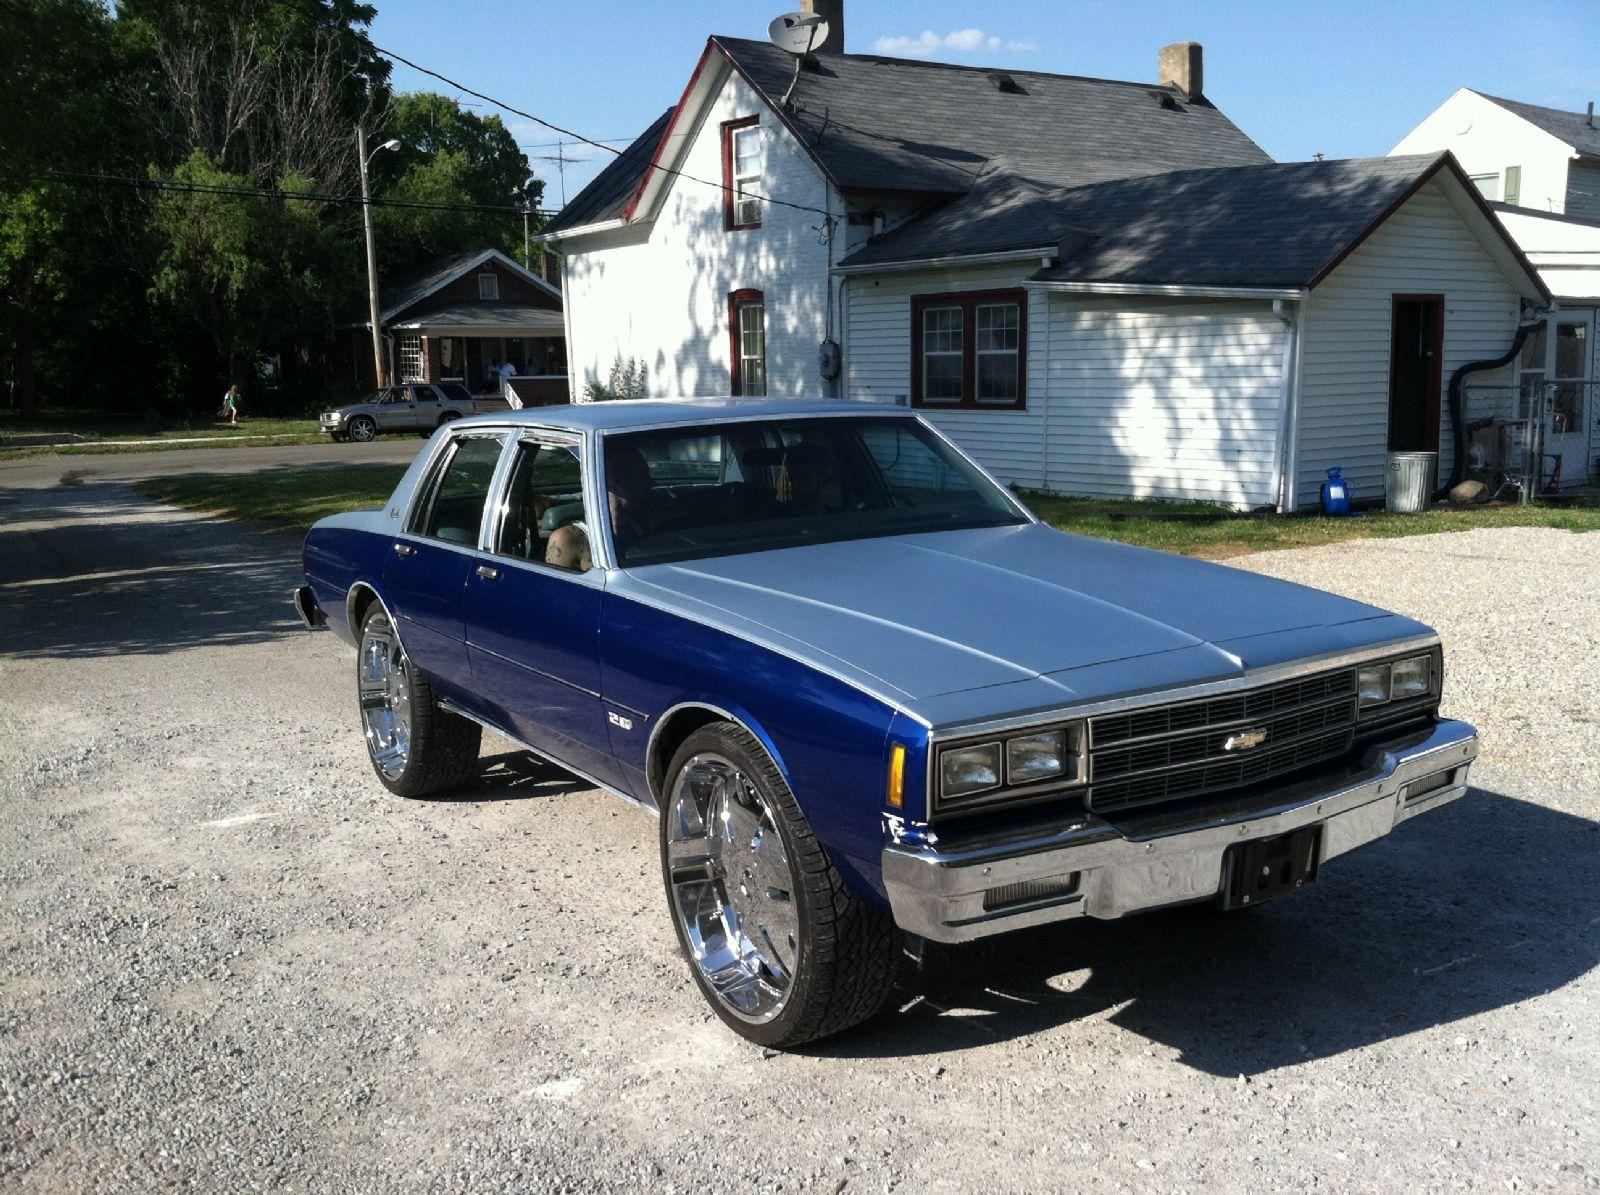 1981 chevrolet impala for sale piqua ohio. Black Bedroom Furniture Sets. Home Design Ideas